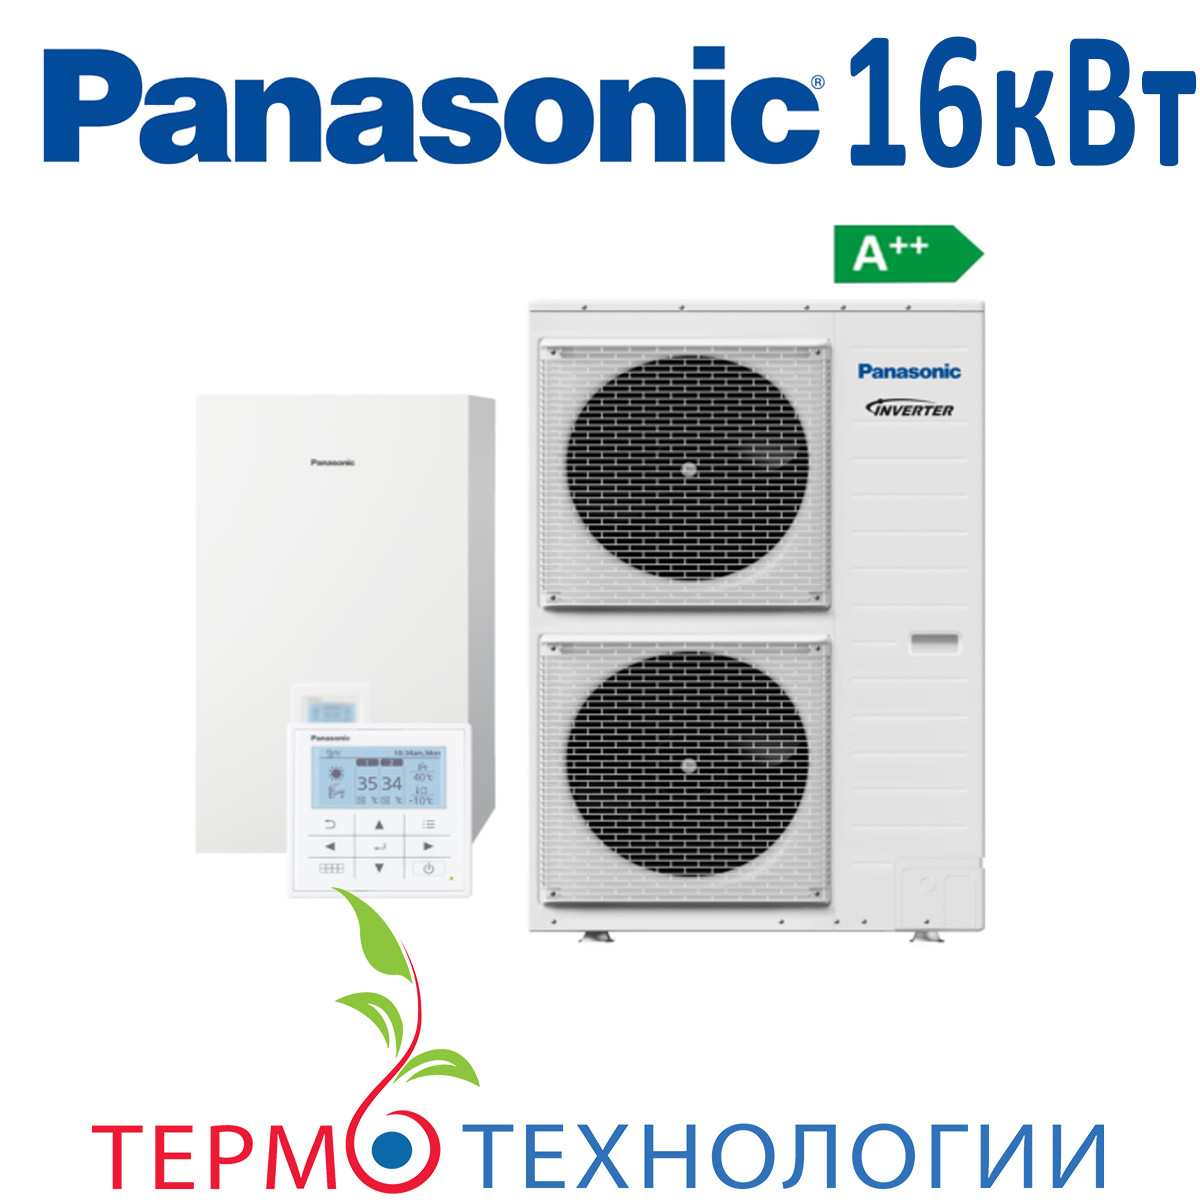 Тепловой насос воздух-вода Panasonic 16 кВт T-CAP с гидромодулем